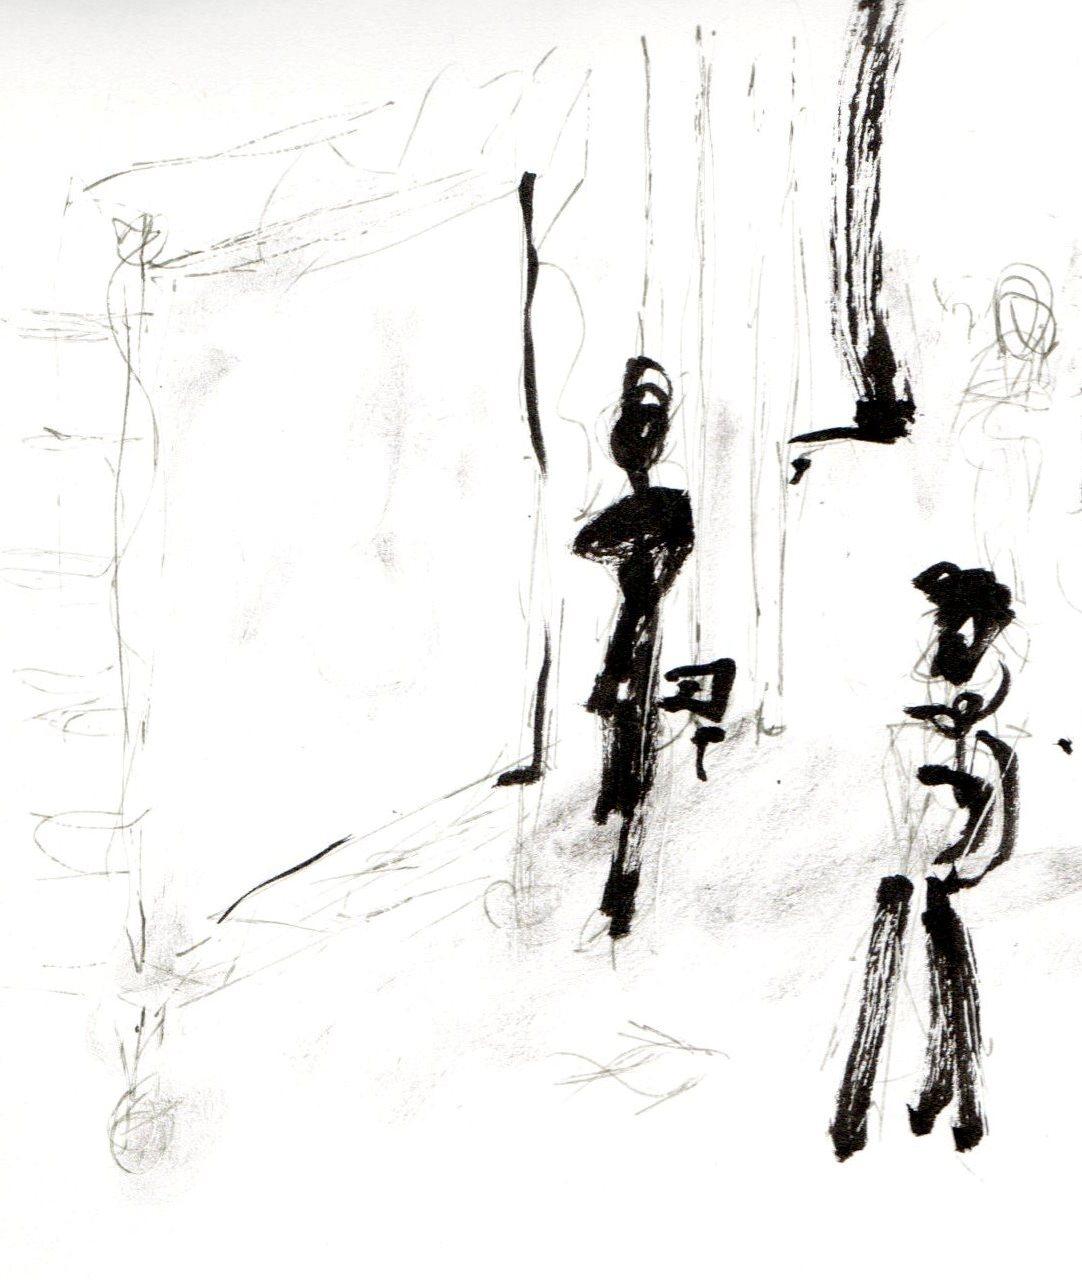 Flon Streetpainting 2009 9a